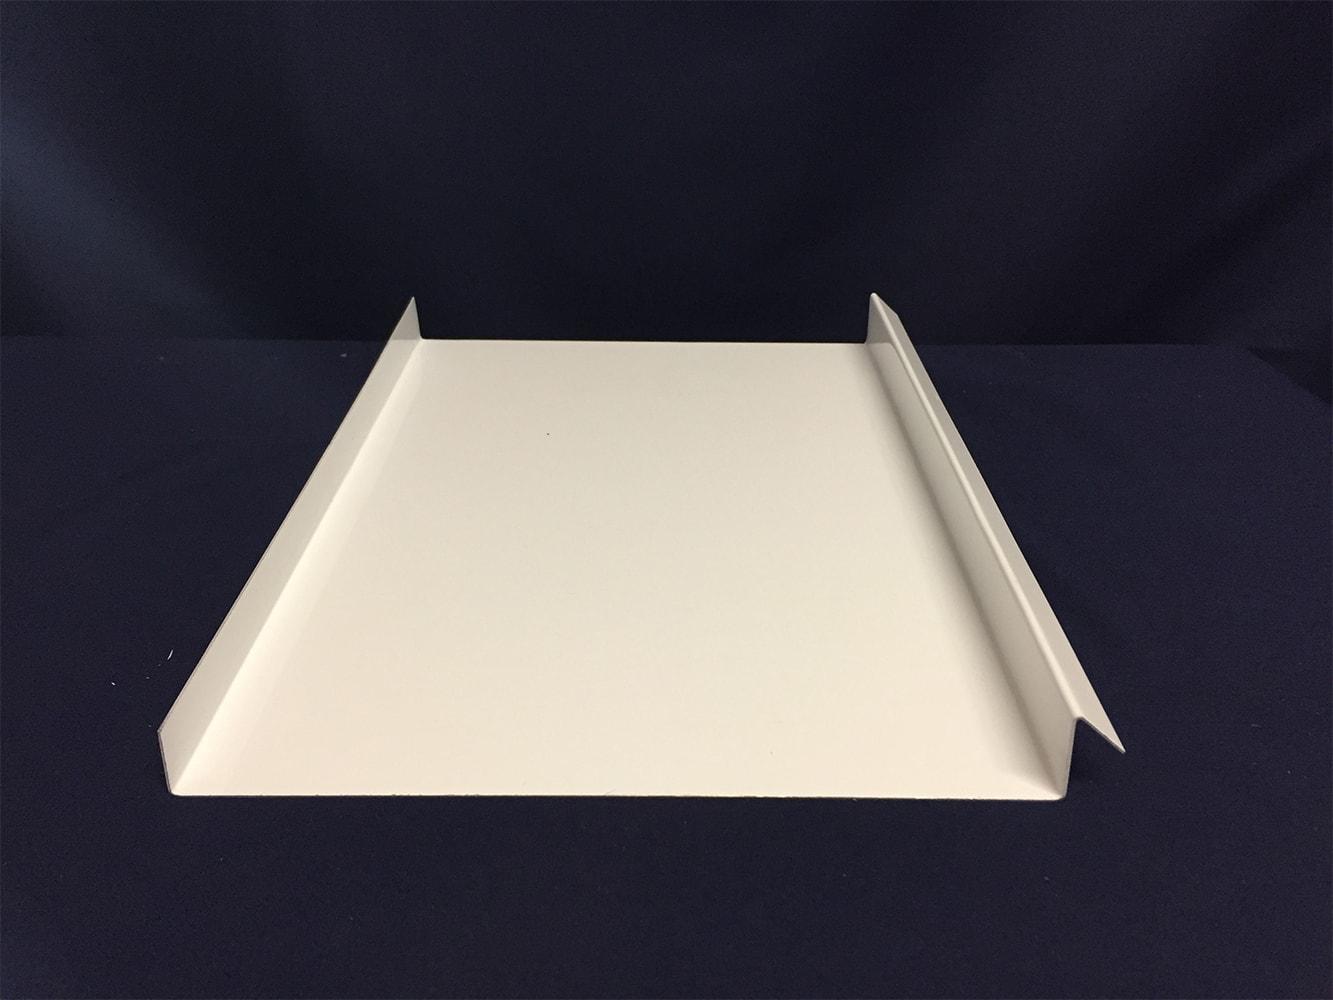 ice belt panels  u2013 dave u0026 39 s sheet metal